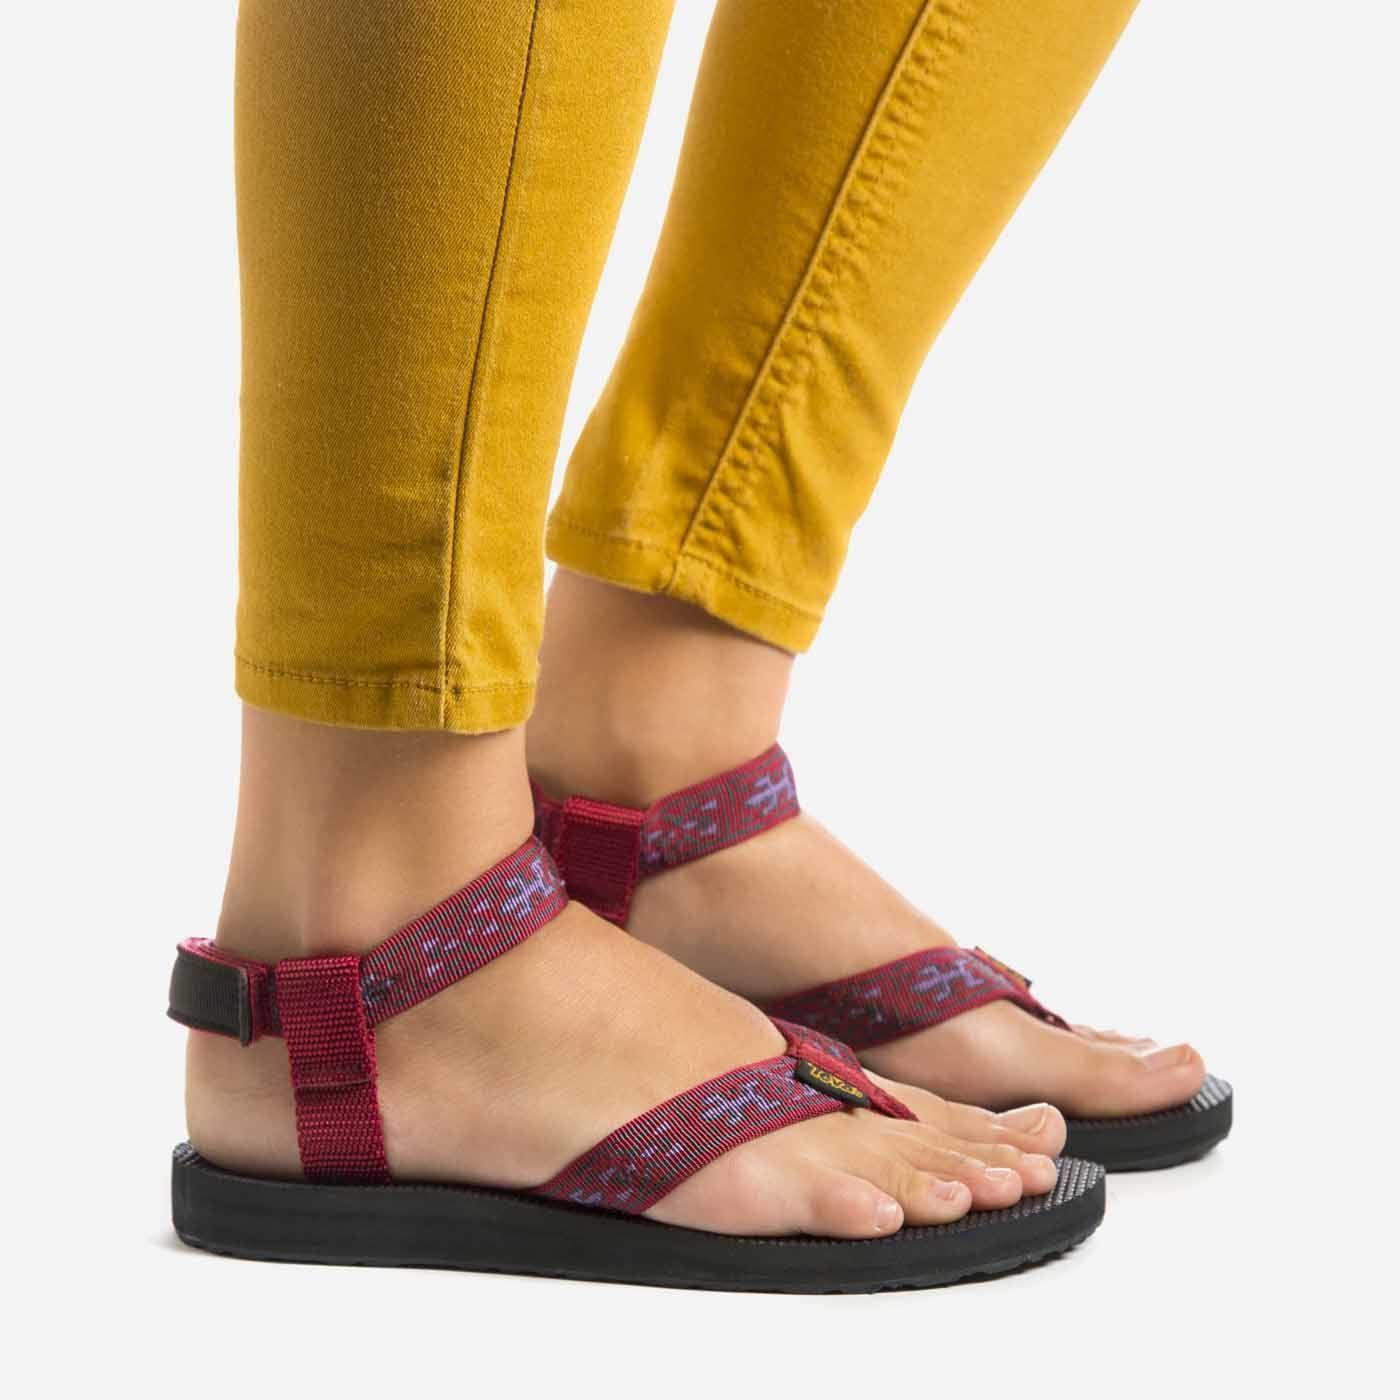 Teva® Official | Women's Original Sandal | Free Shipping at Teva.com